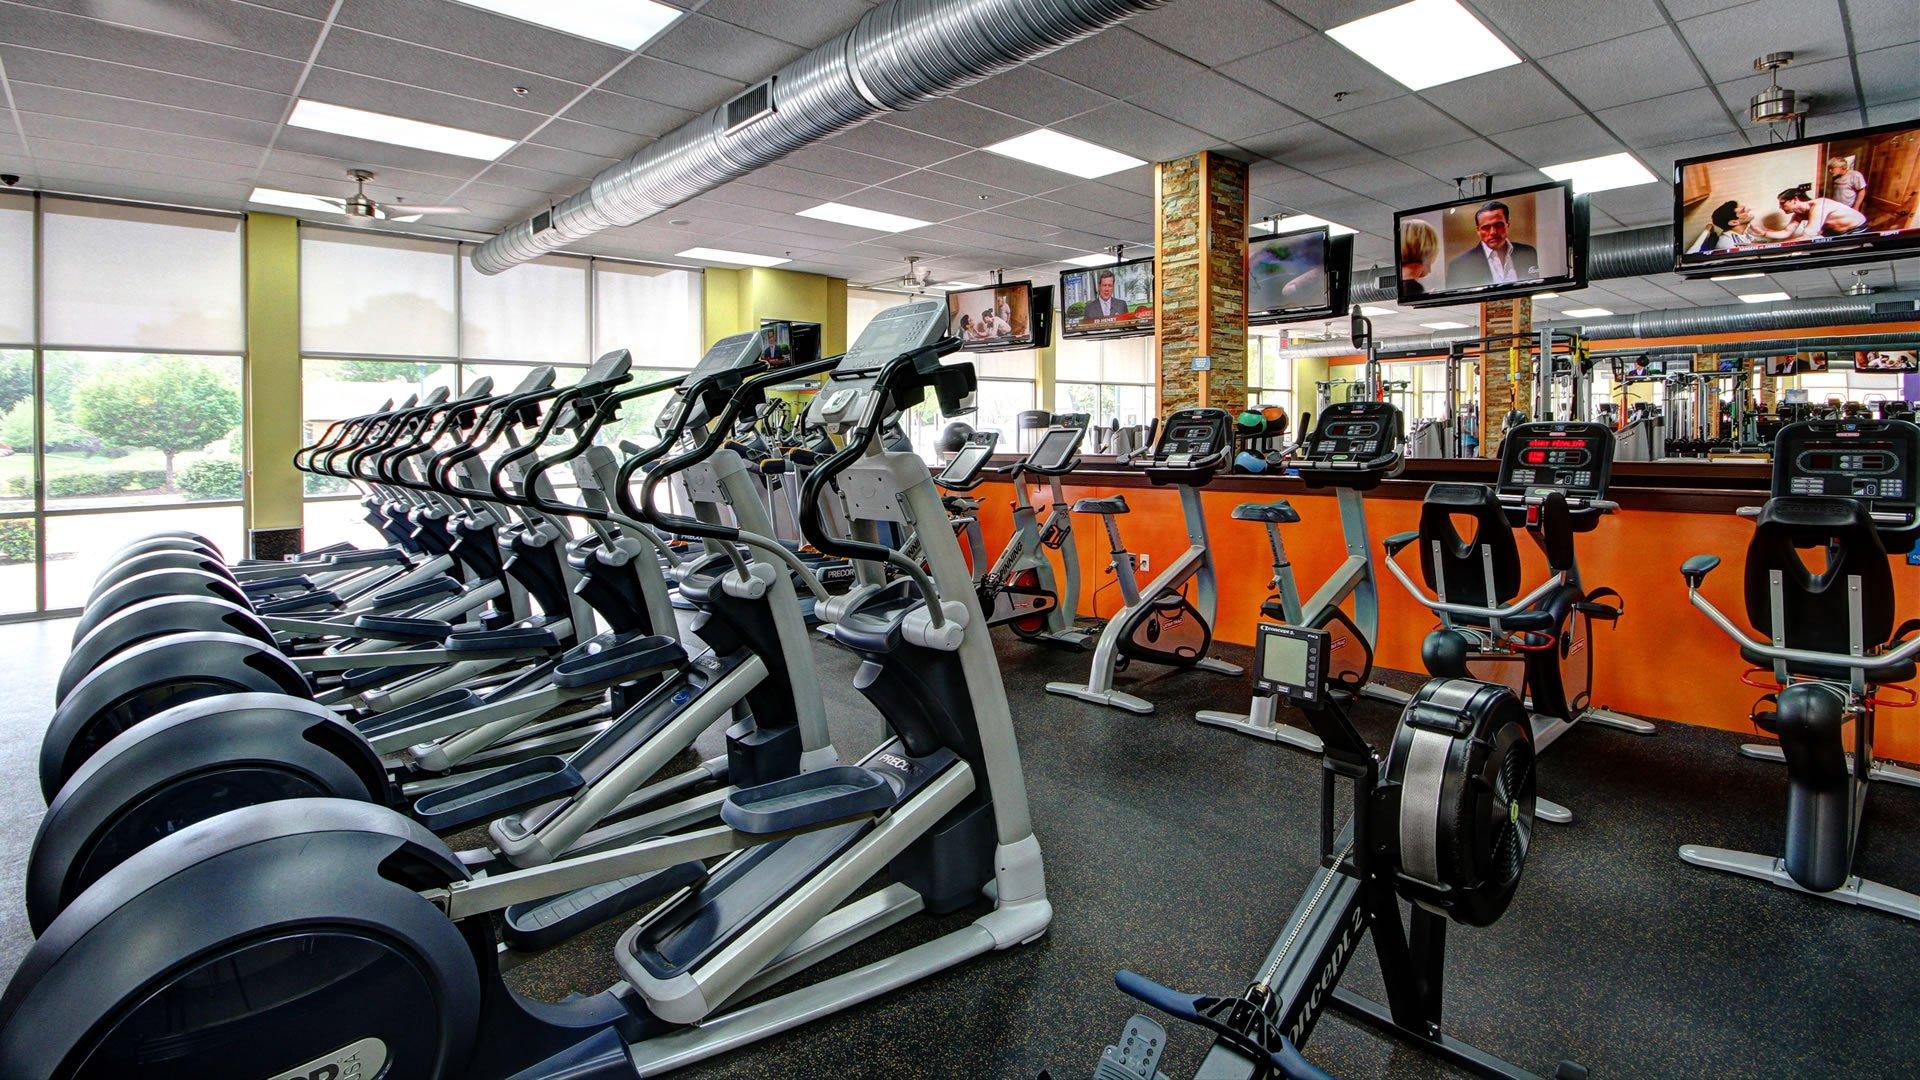 Newport News 24 Hour Xpress Gym